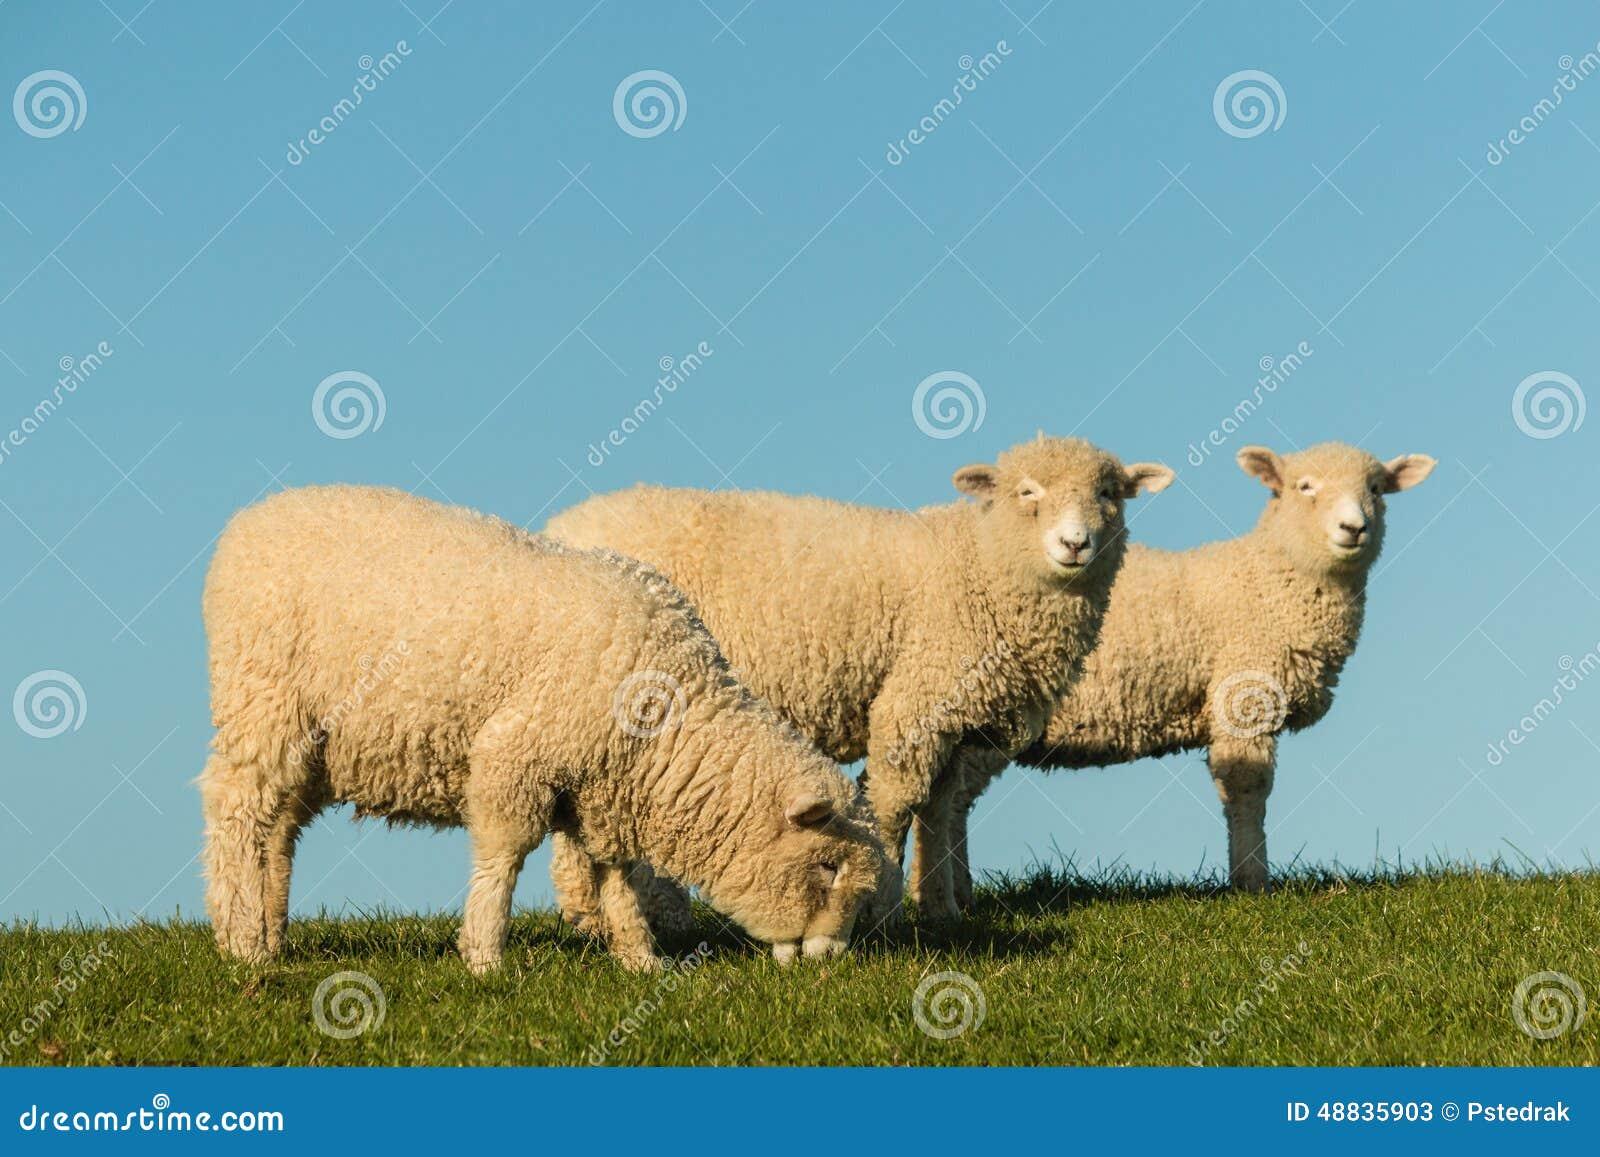 Three sheep - photo#20